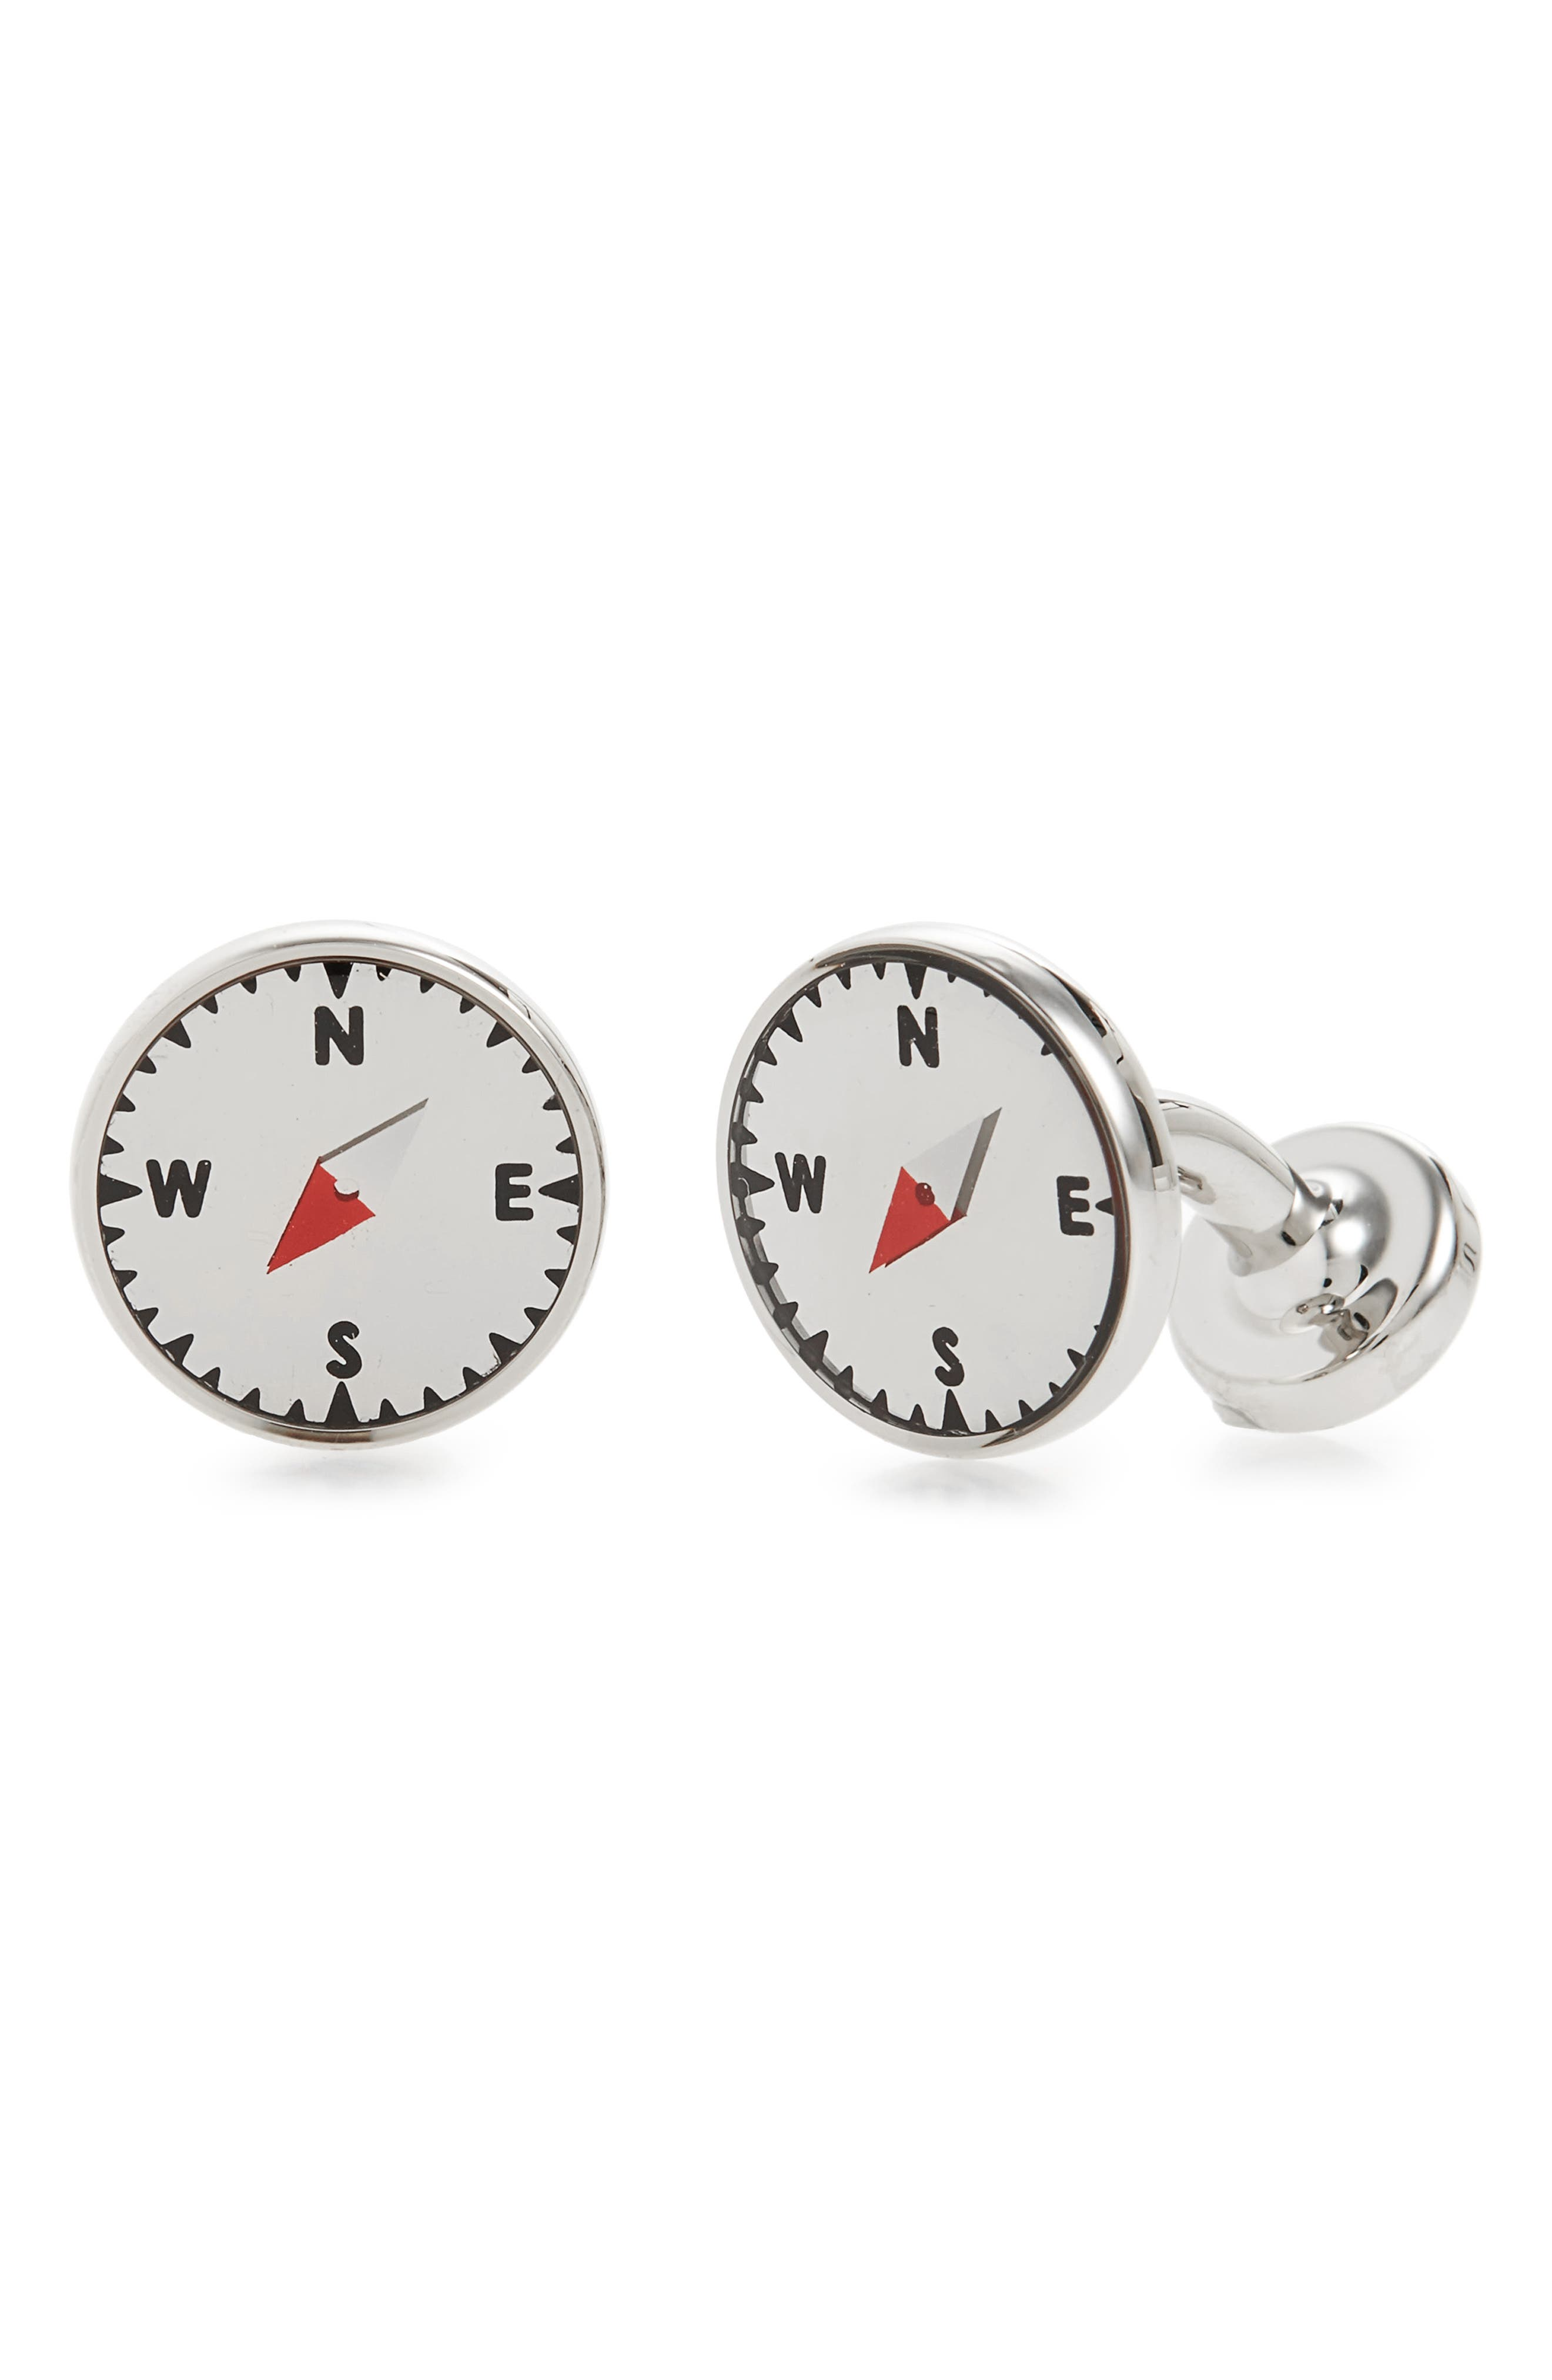 Compass Cuff Links,                         Main,                         color, Light Pastel Grey